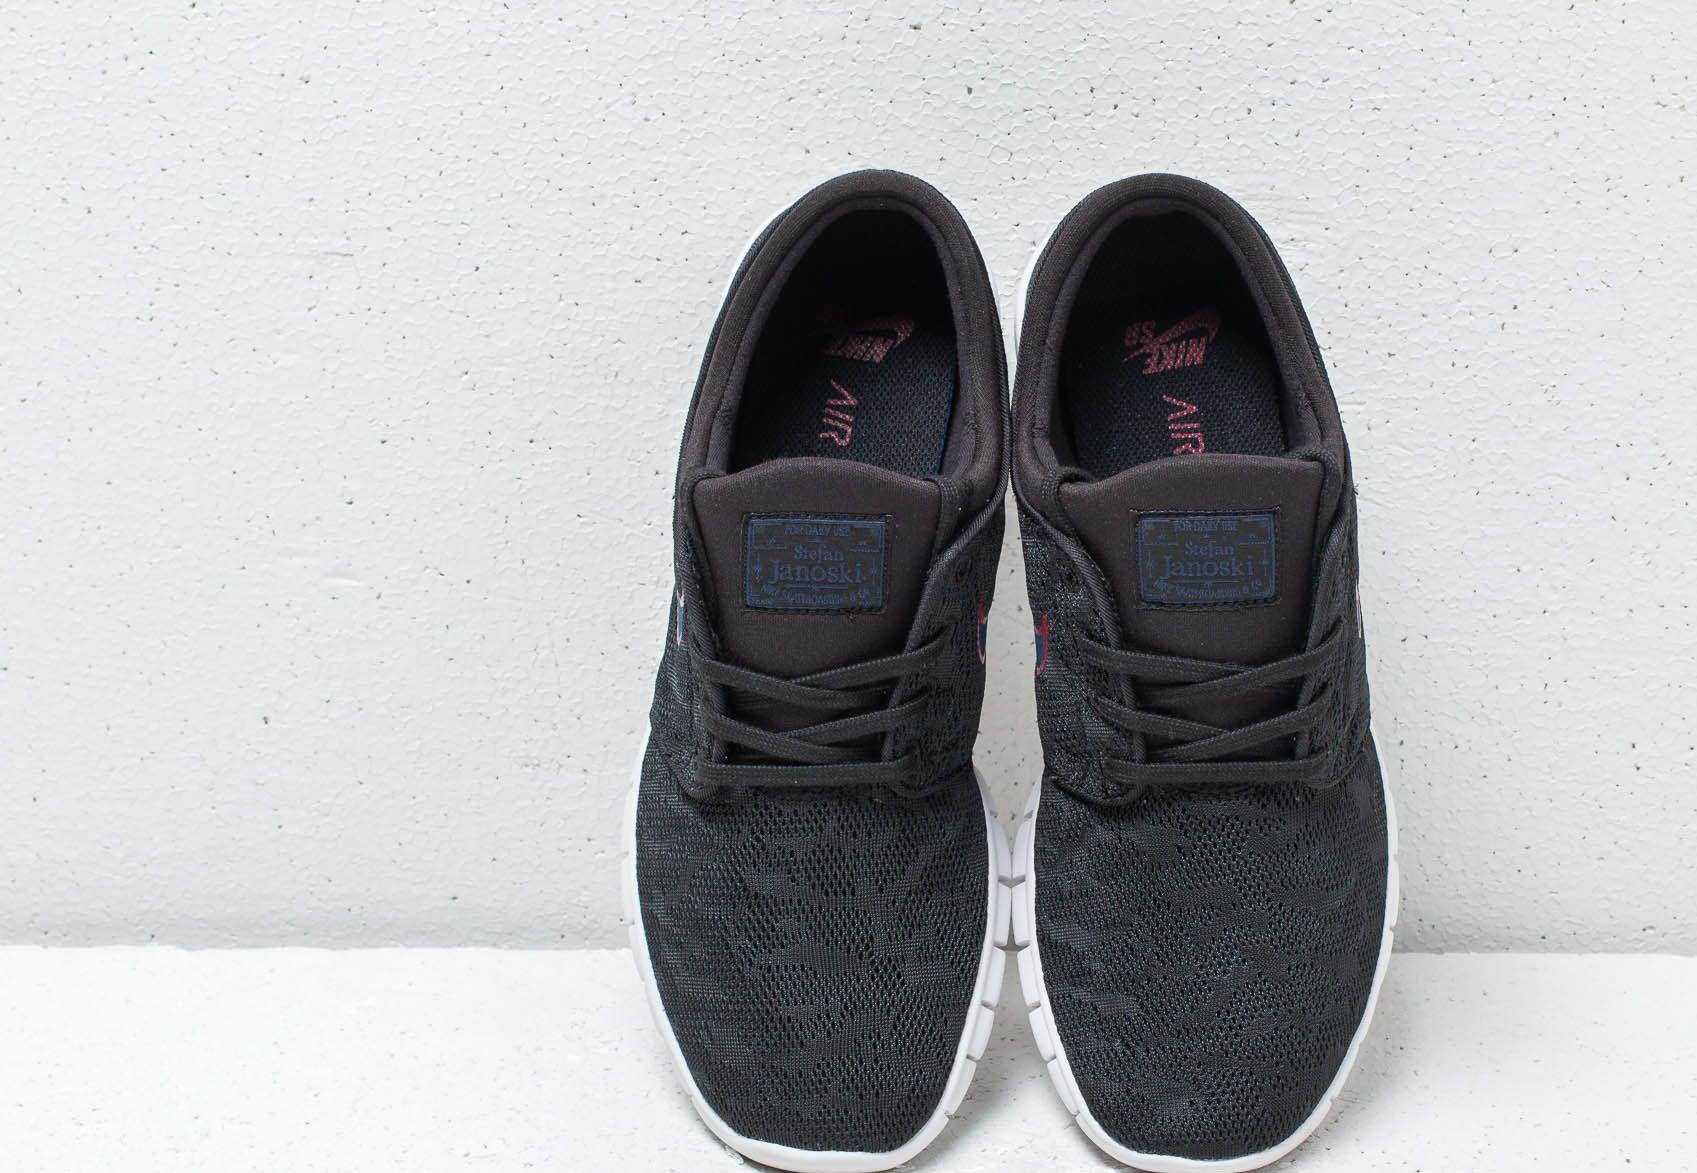 new style d7c7f 5d166 Nike Sb Stefan Janoski Max Black  Blue Void for Men - Save 1% - Lyst